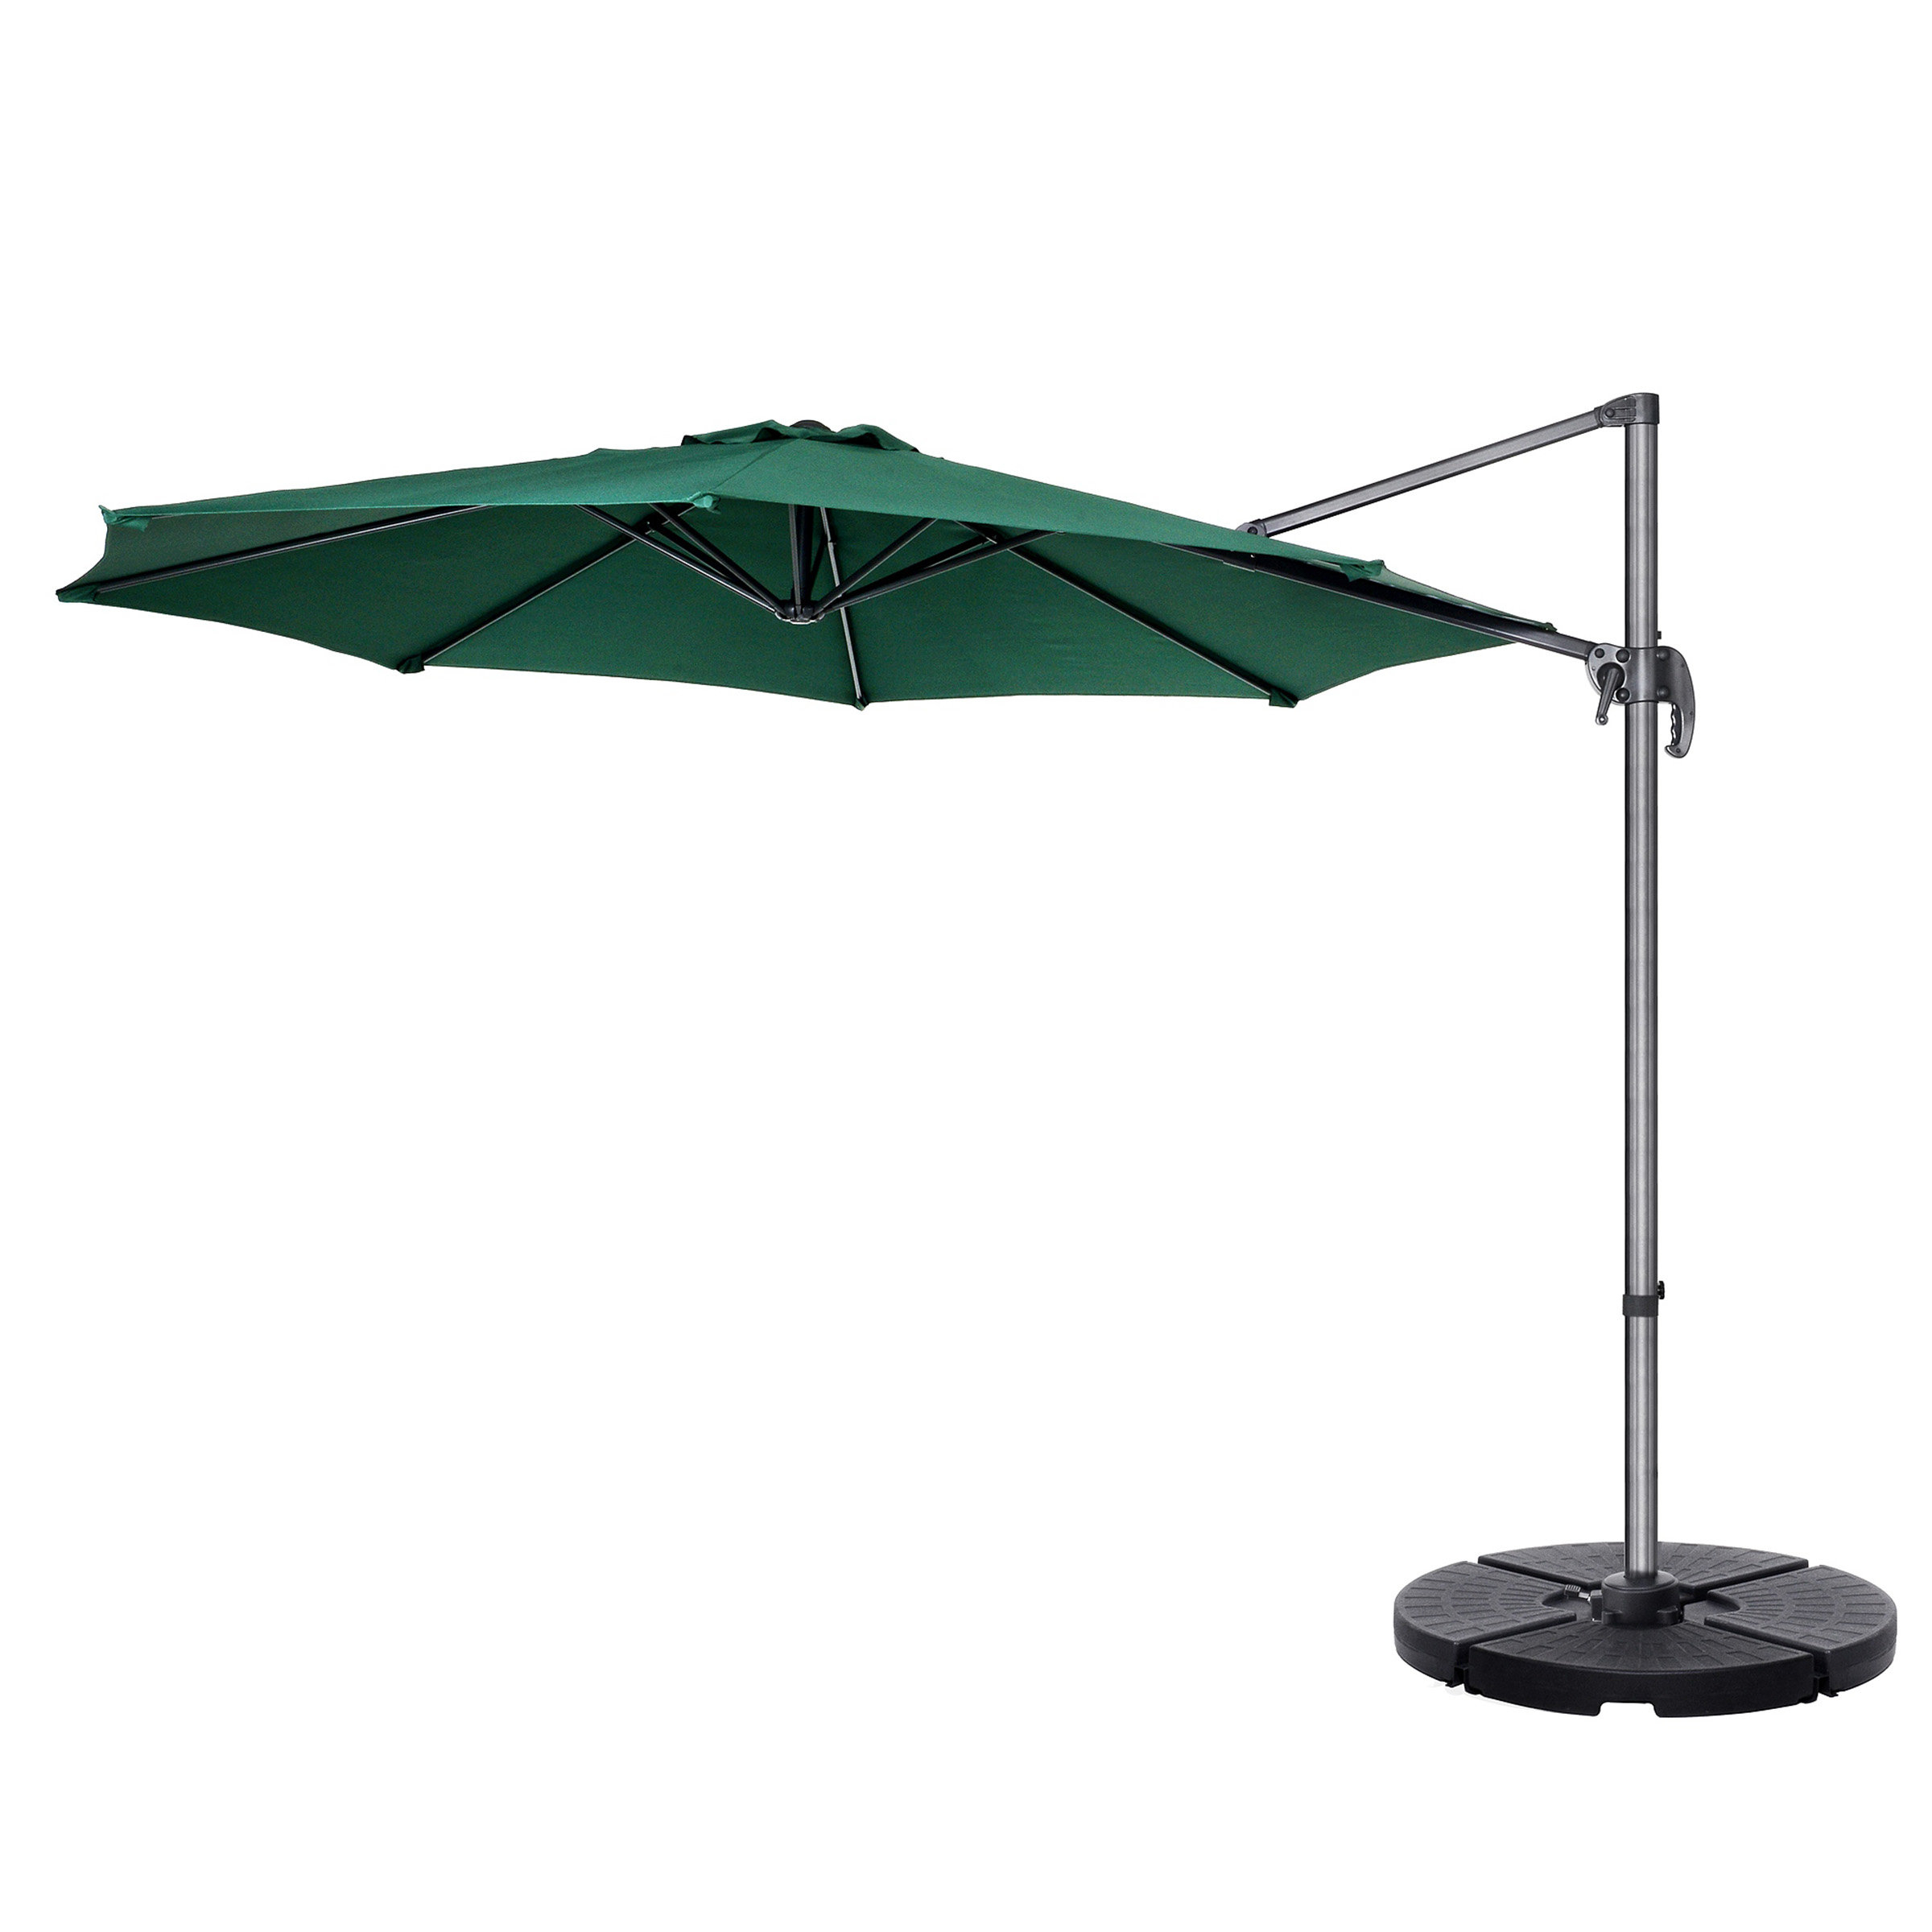 Lytham Cantilever Umbrellas With Famous Freeport Park Cockermouth Rotating 10' Cantilever Umbrella (View 13 of 20)